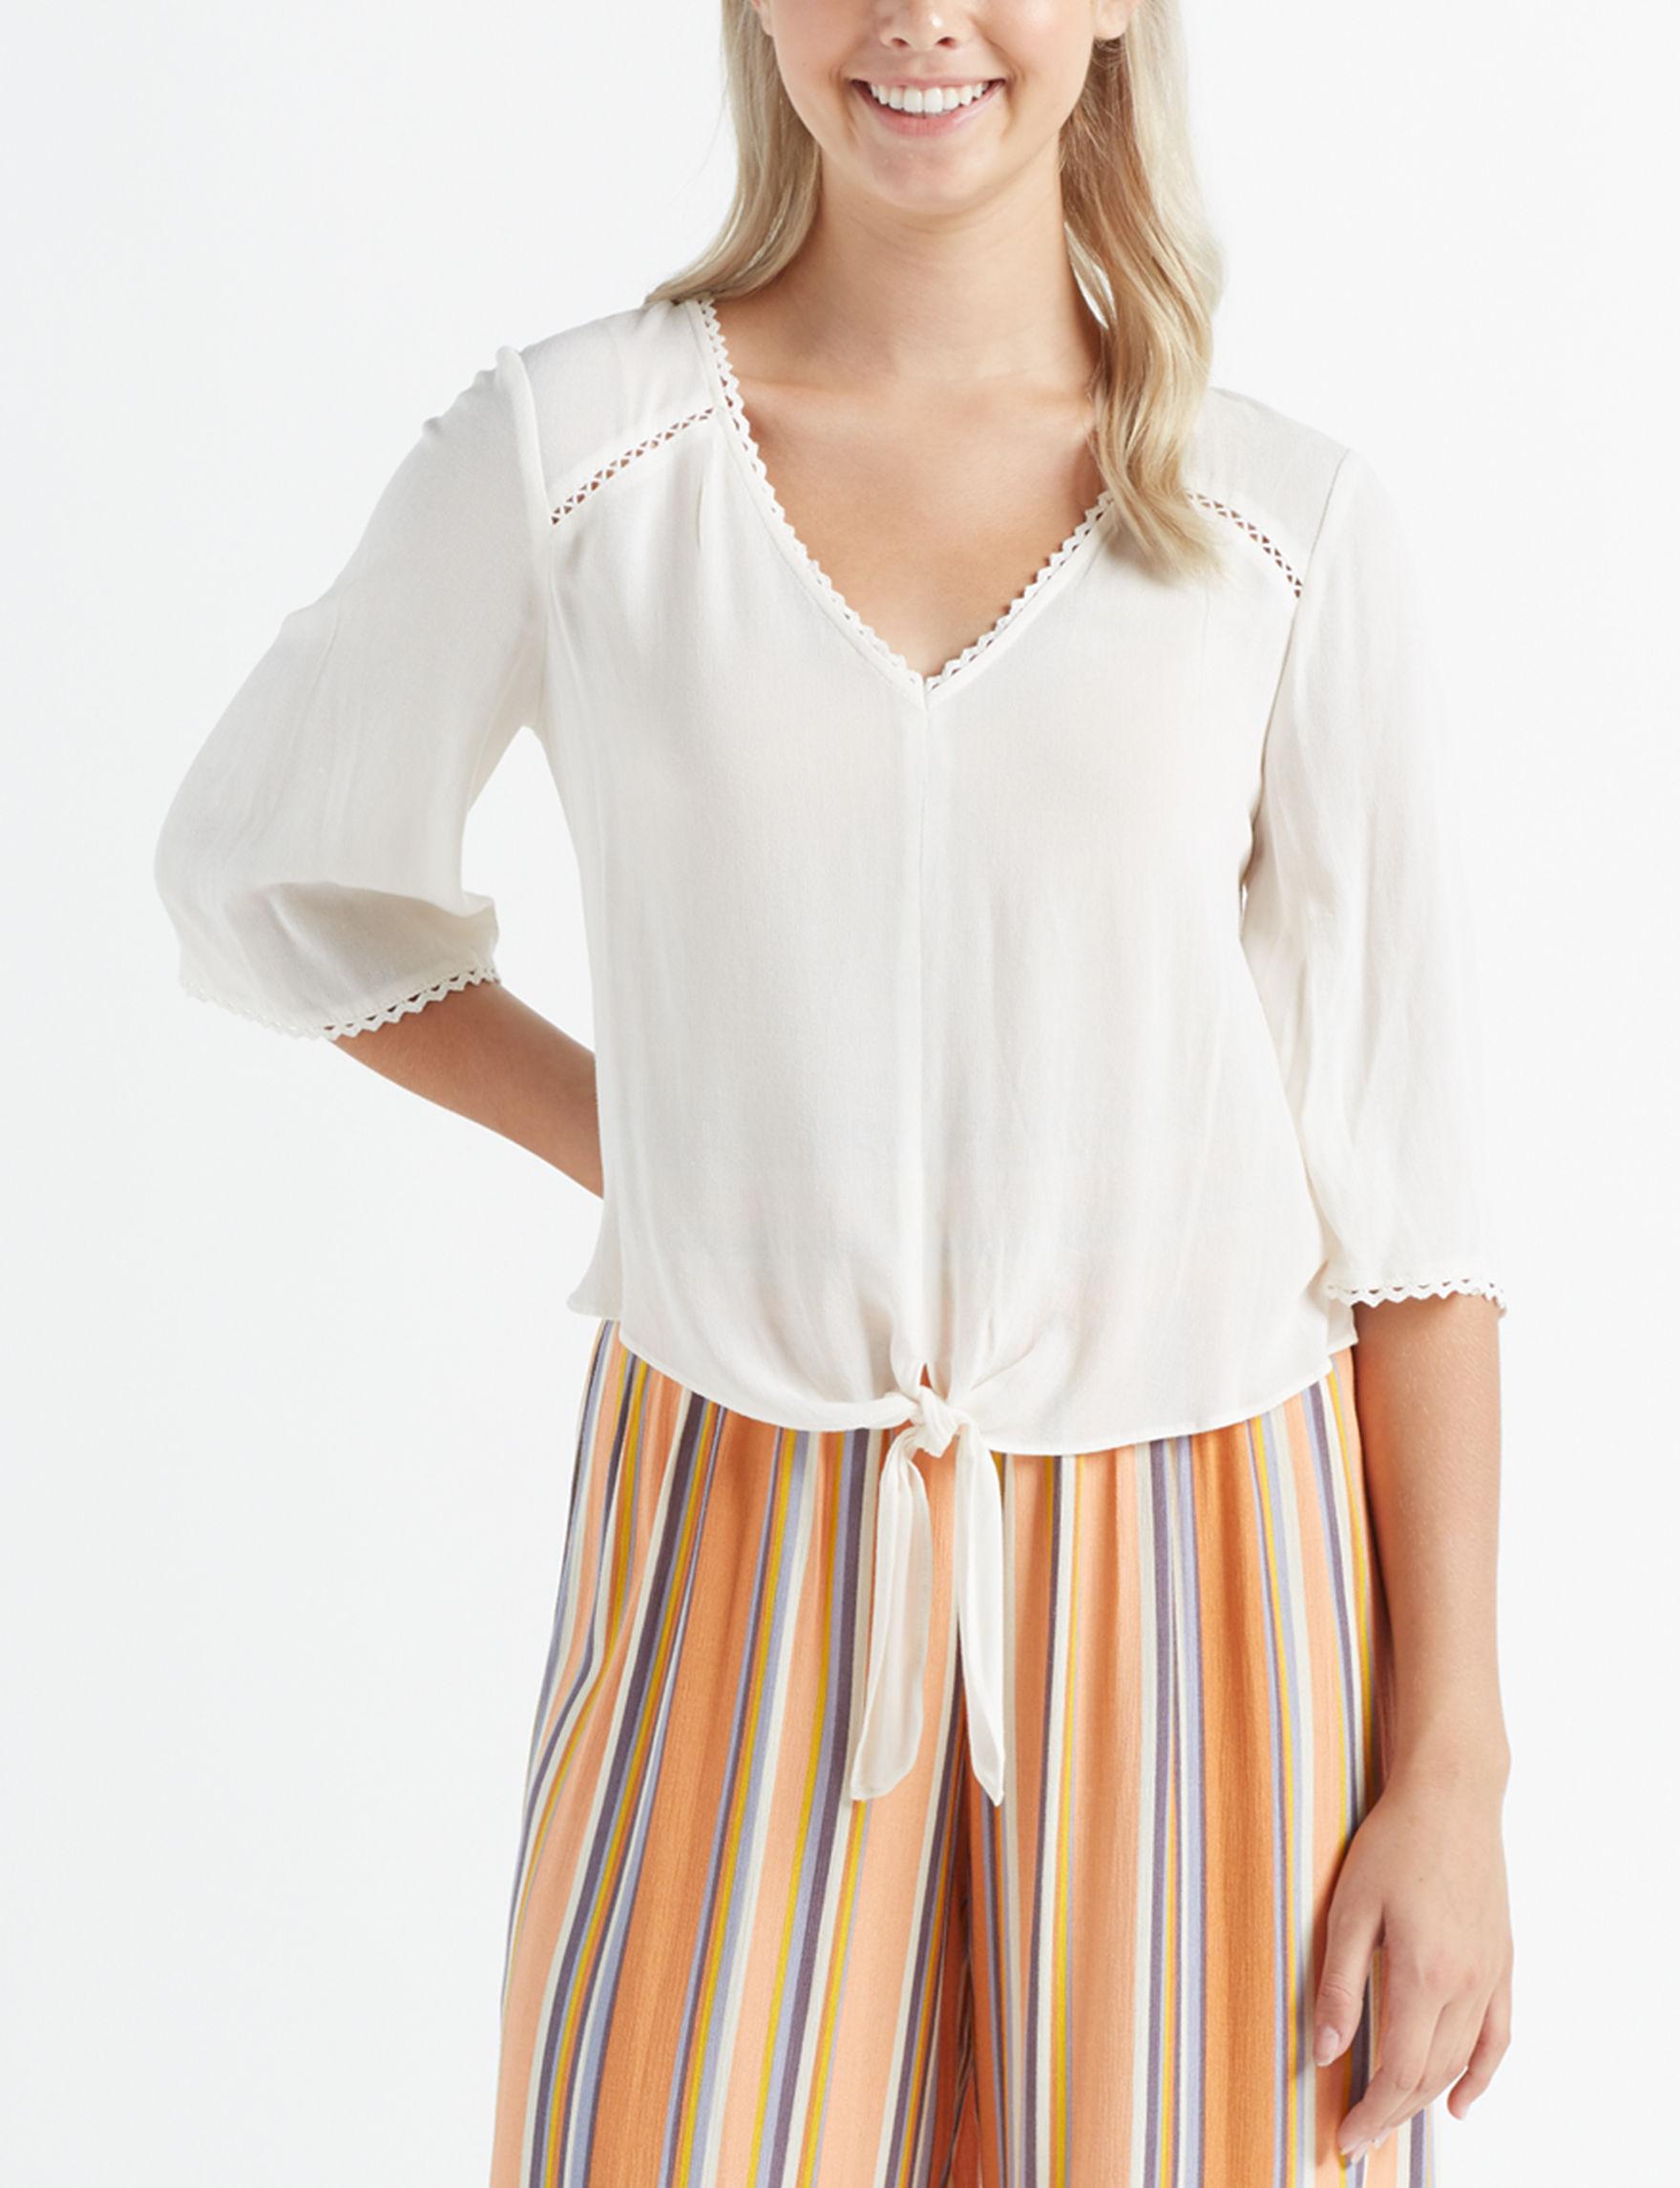 Leighton Ivory Shirts & Blouses